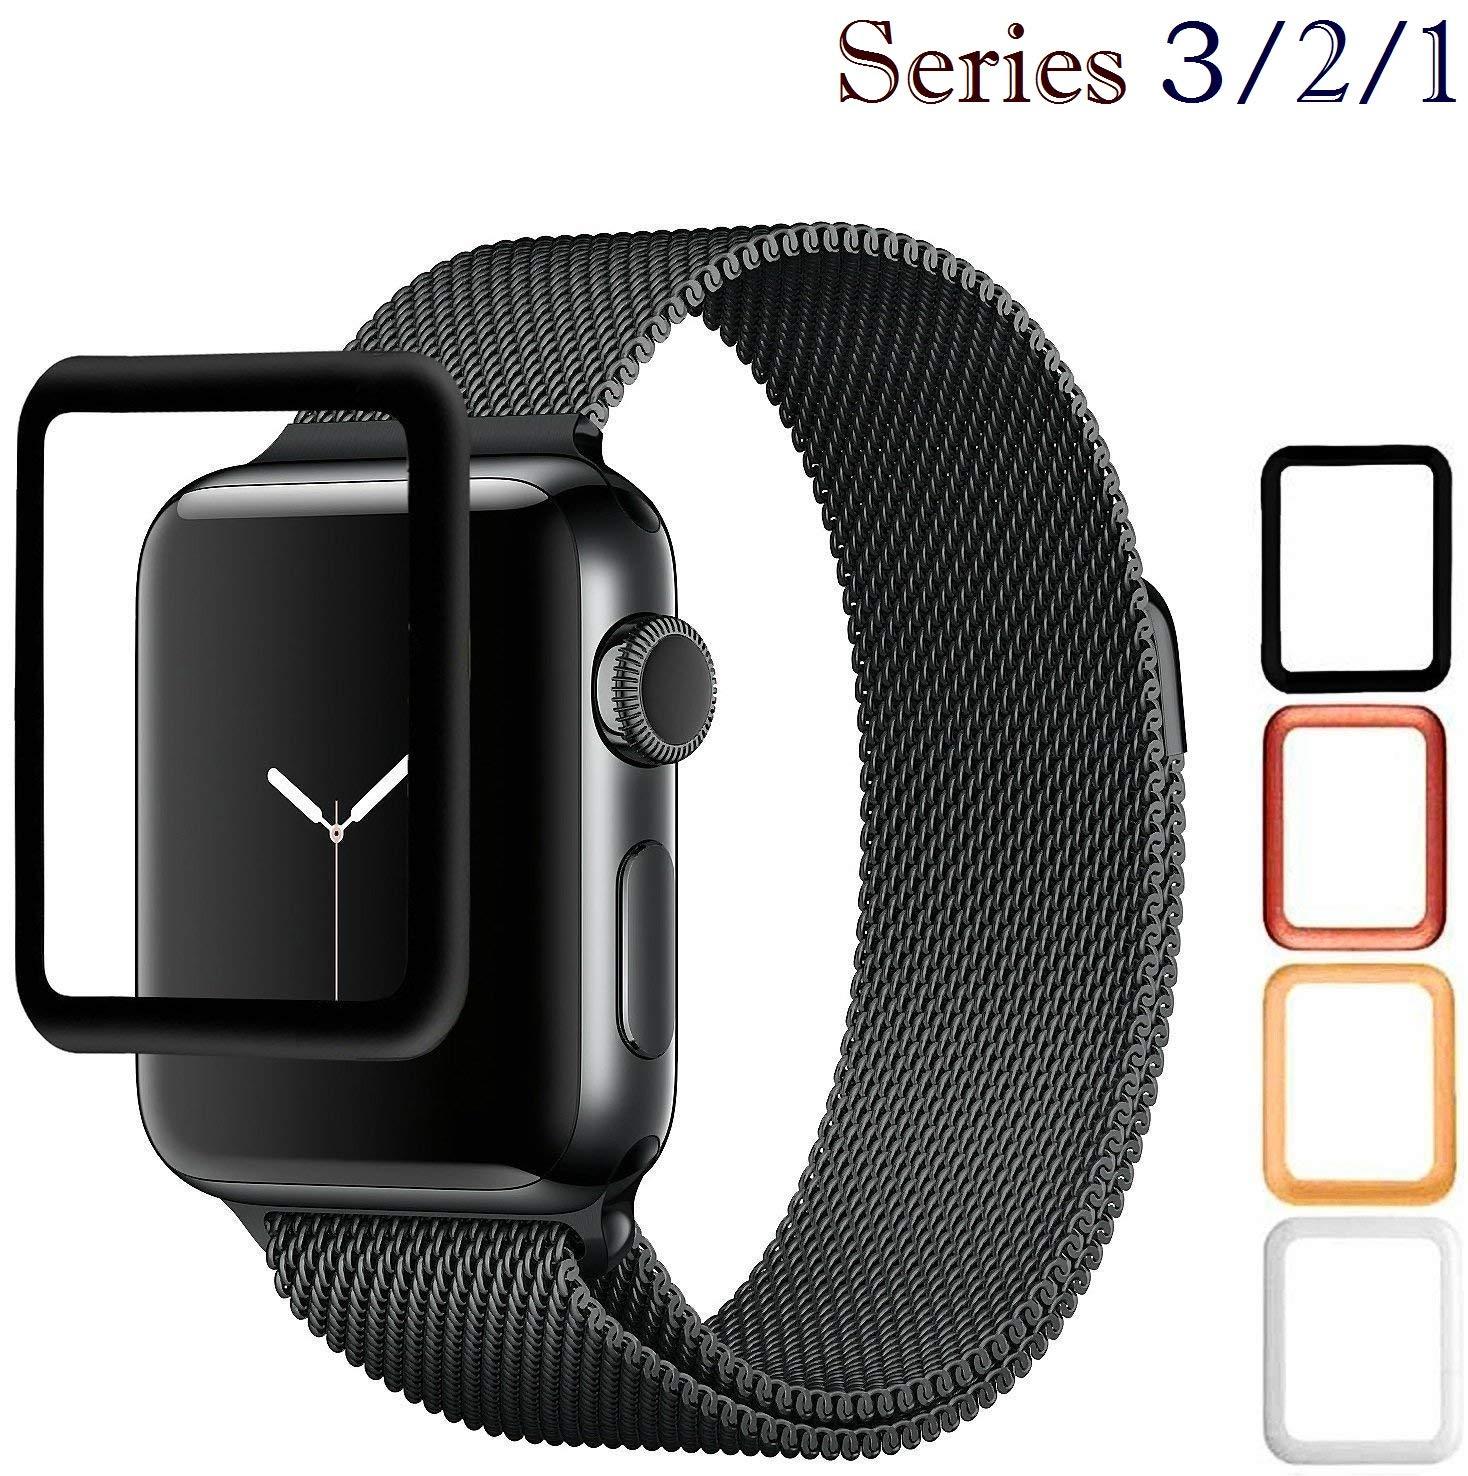 Vidrio Protector para Apple Watch 42mm x JOSI MINEA -7SR4